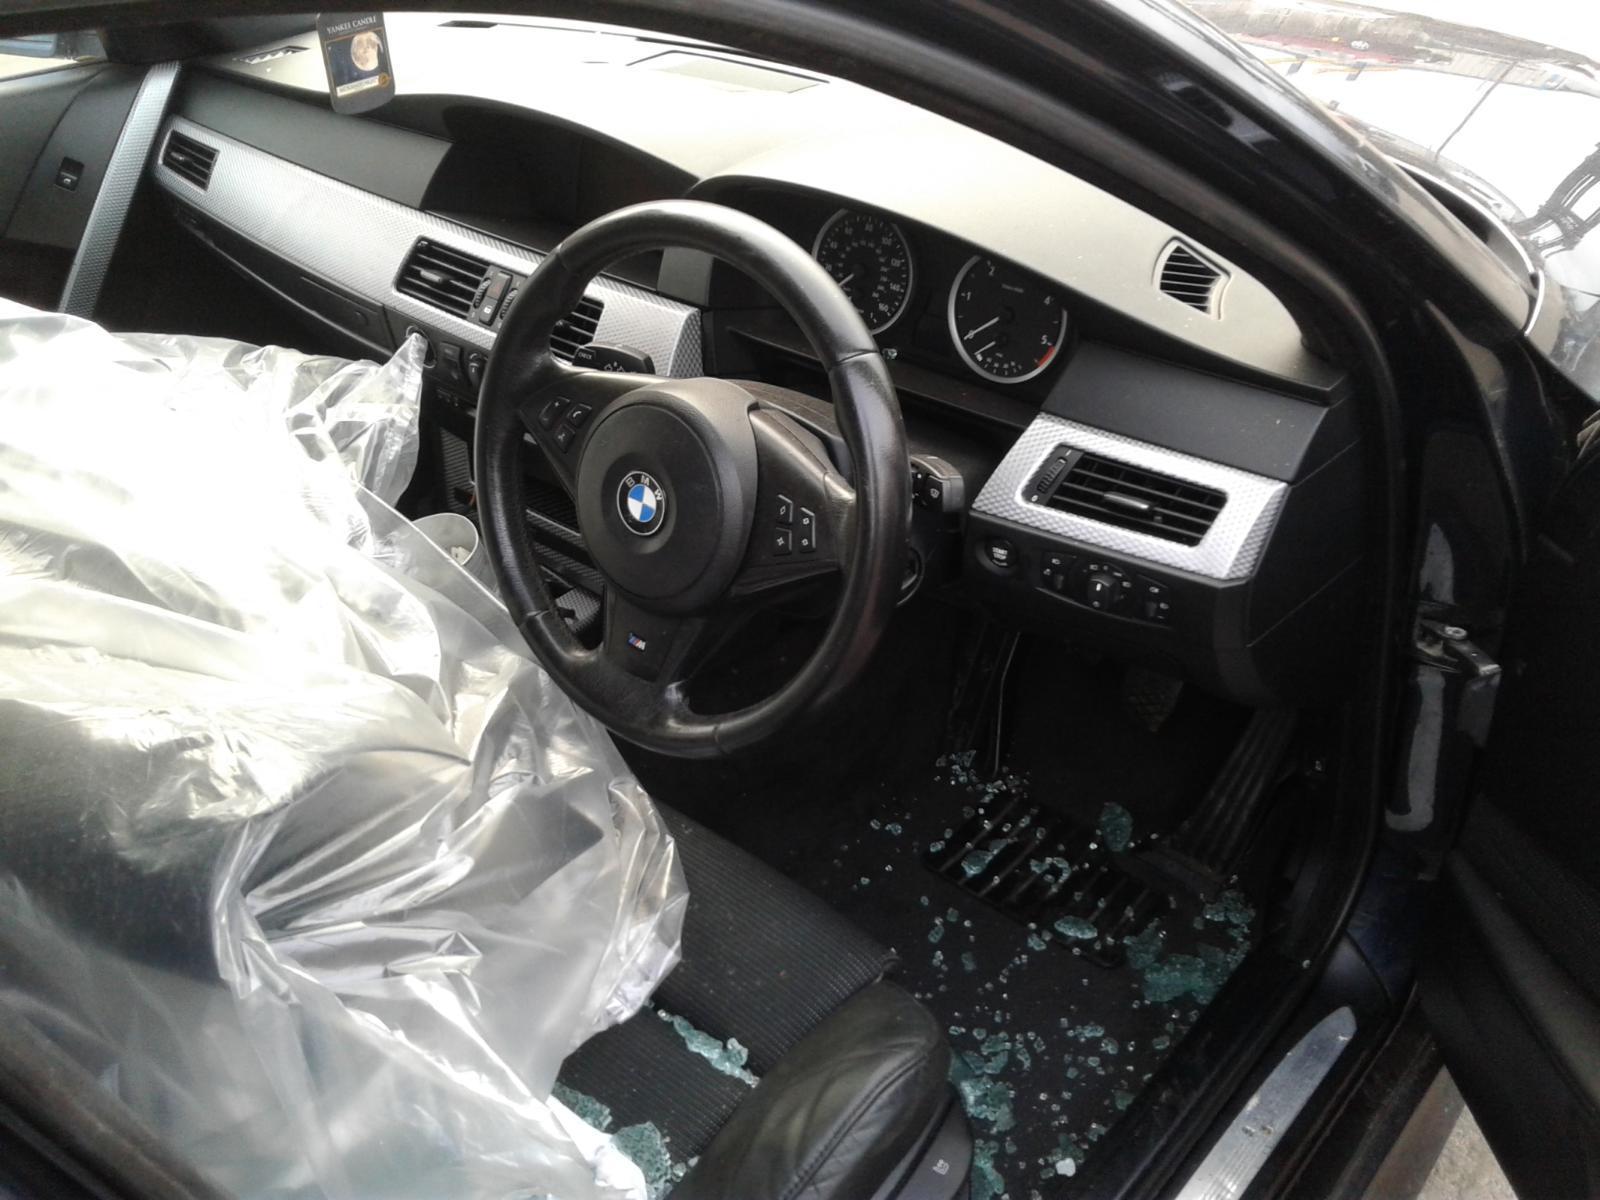 2006 BMW 5 SERIES Image